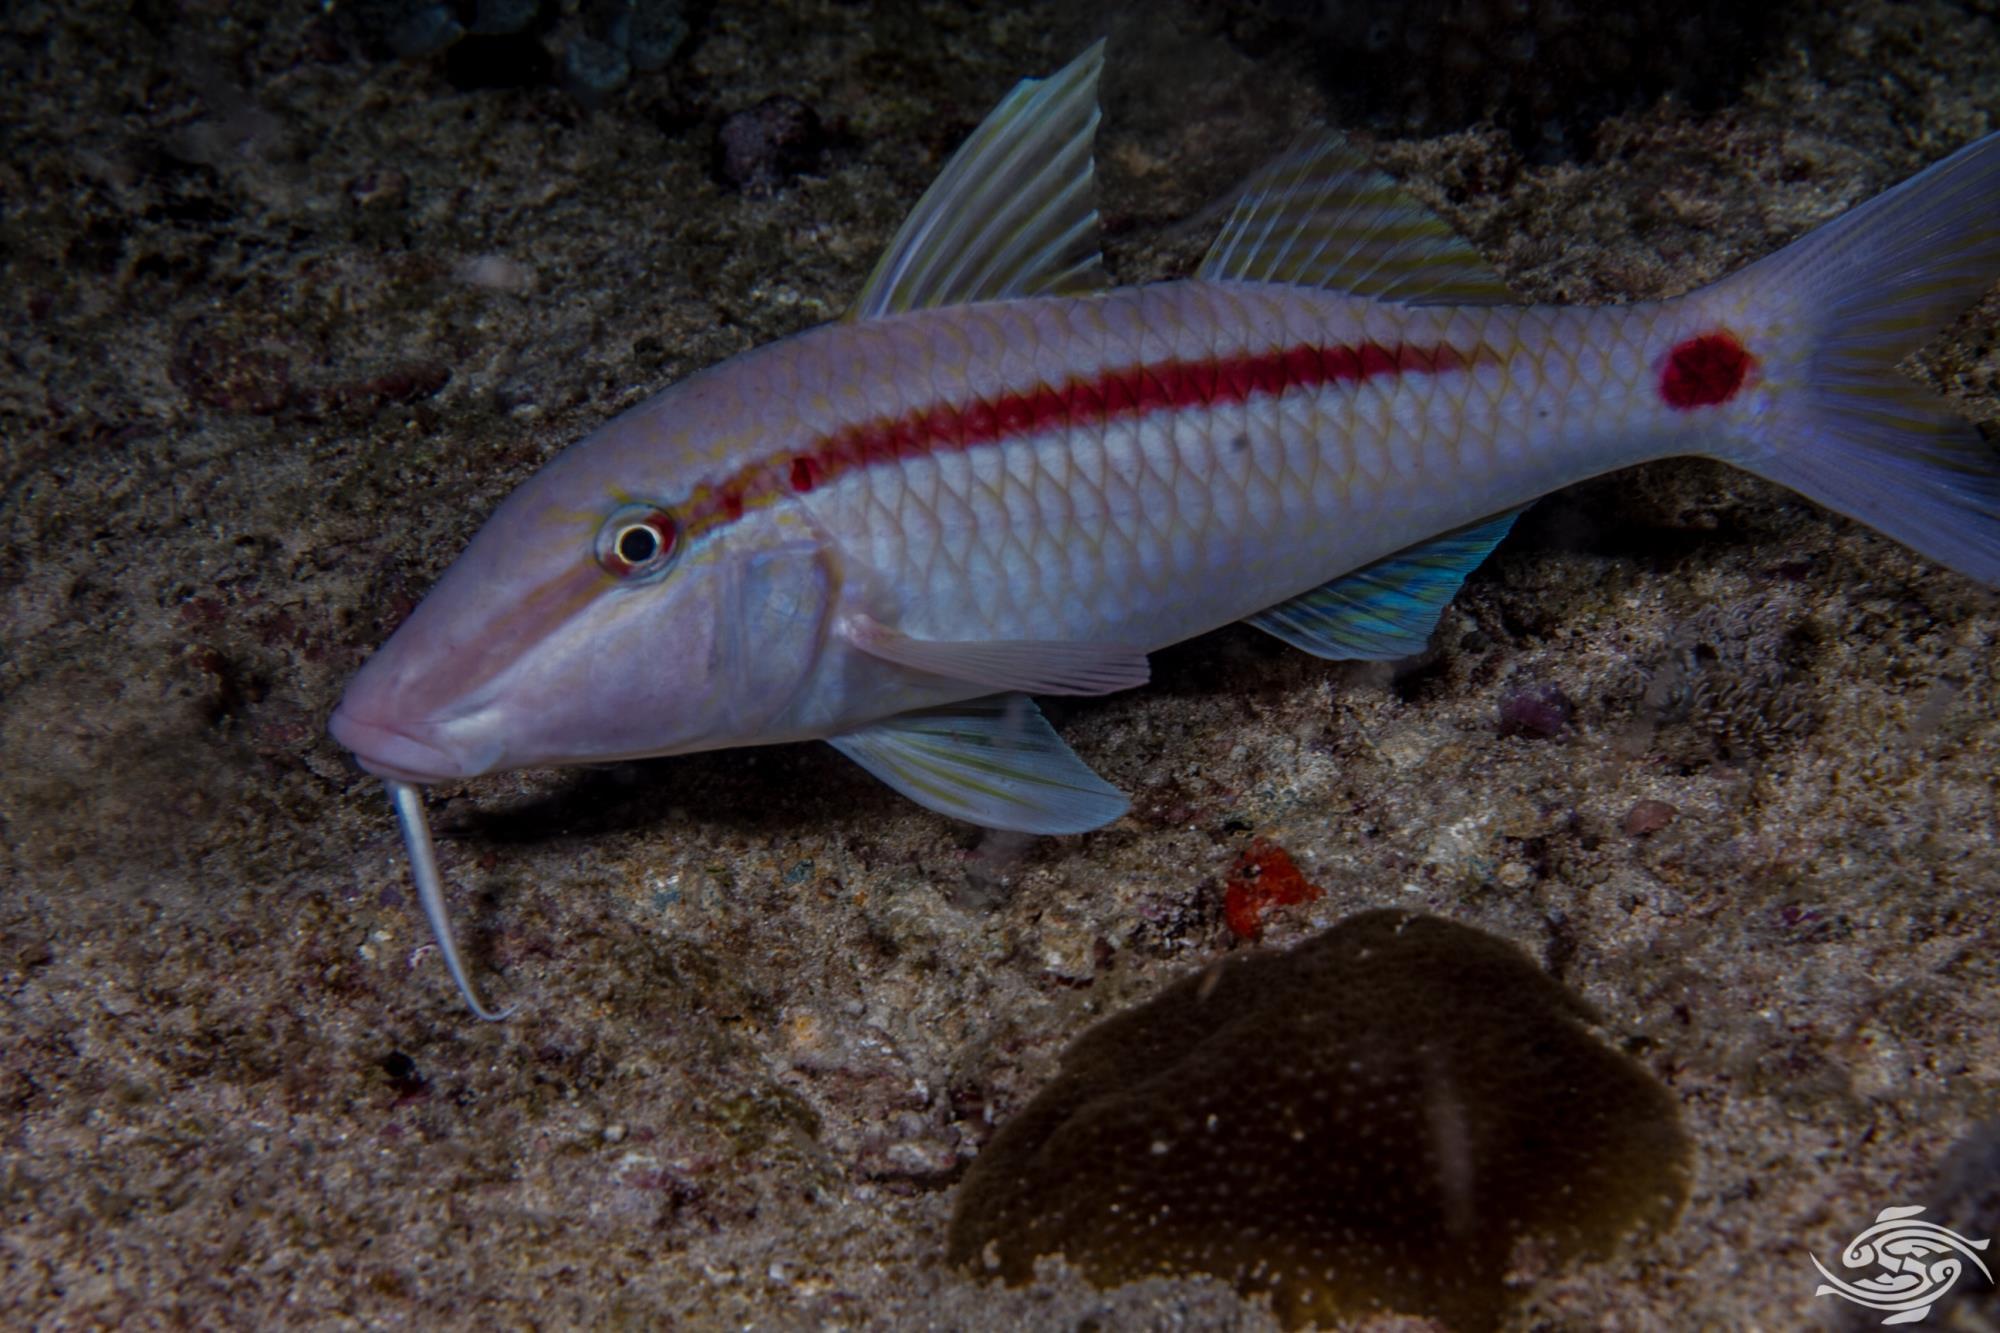 Dash-and-Dot goatfish (Parupeneus barberinus) is also known as the Dash dot Goatfish